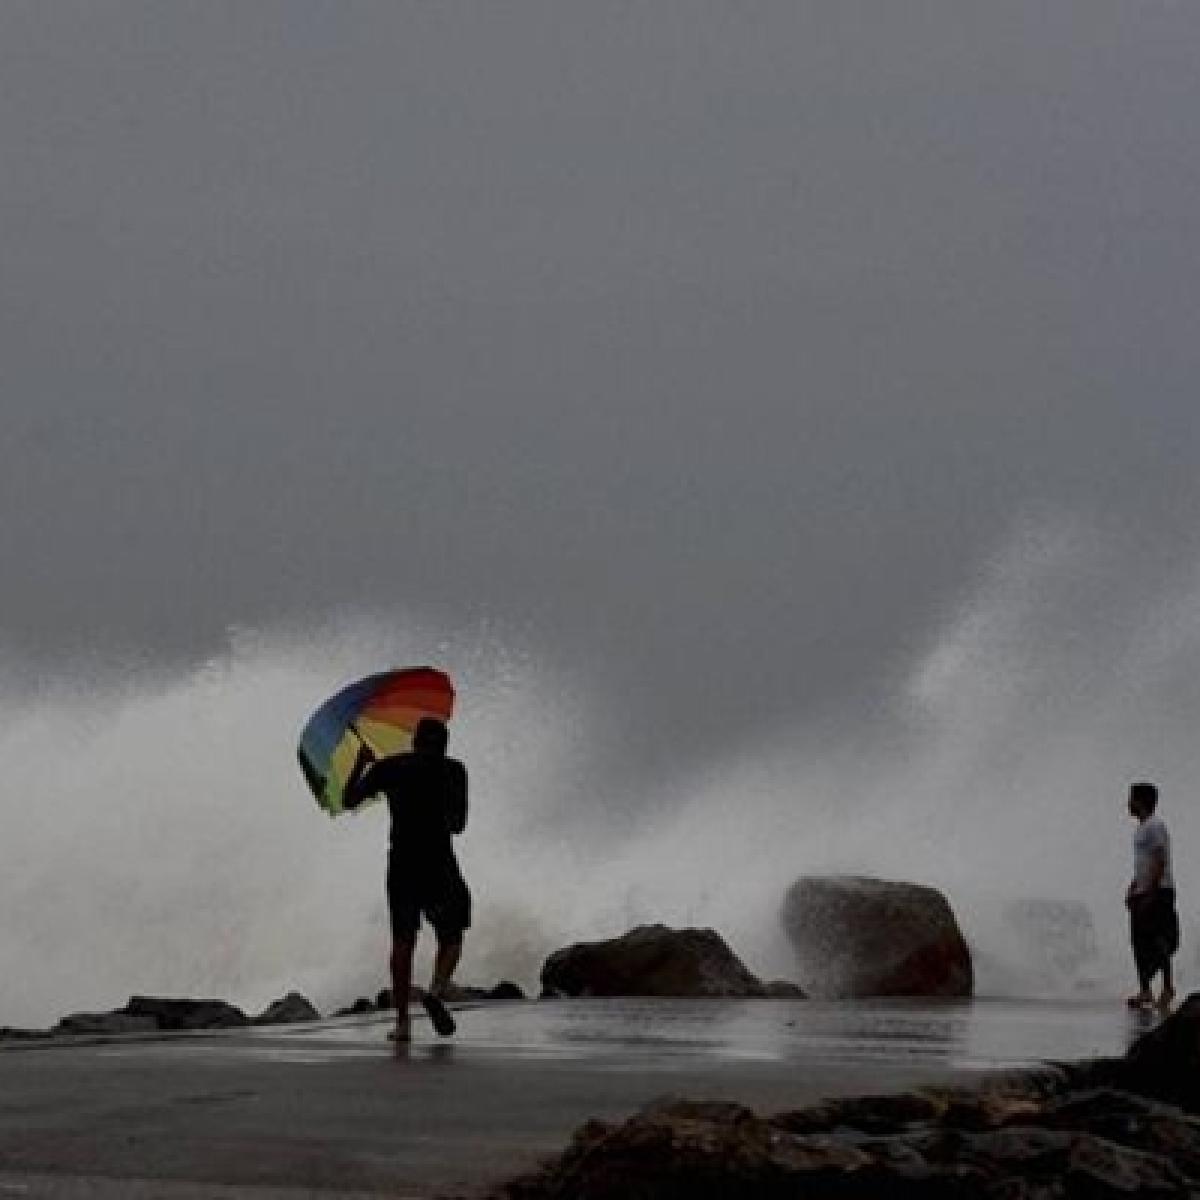 Cyclone Vayu Updates: Fishermen in Gujarat claim heavy losses, seek govt assistance